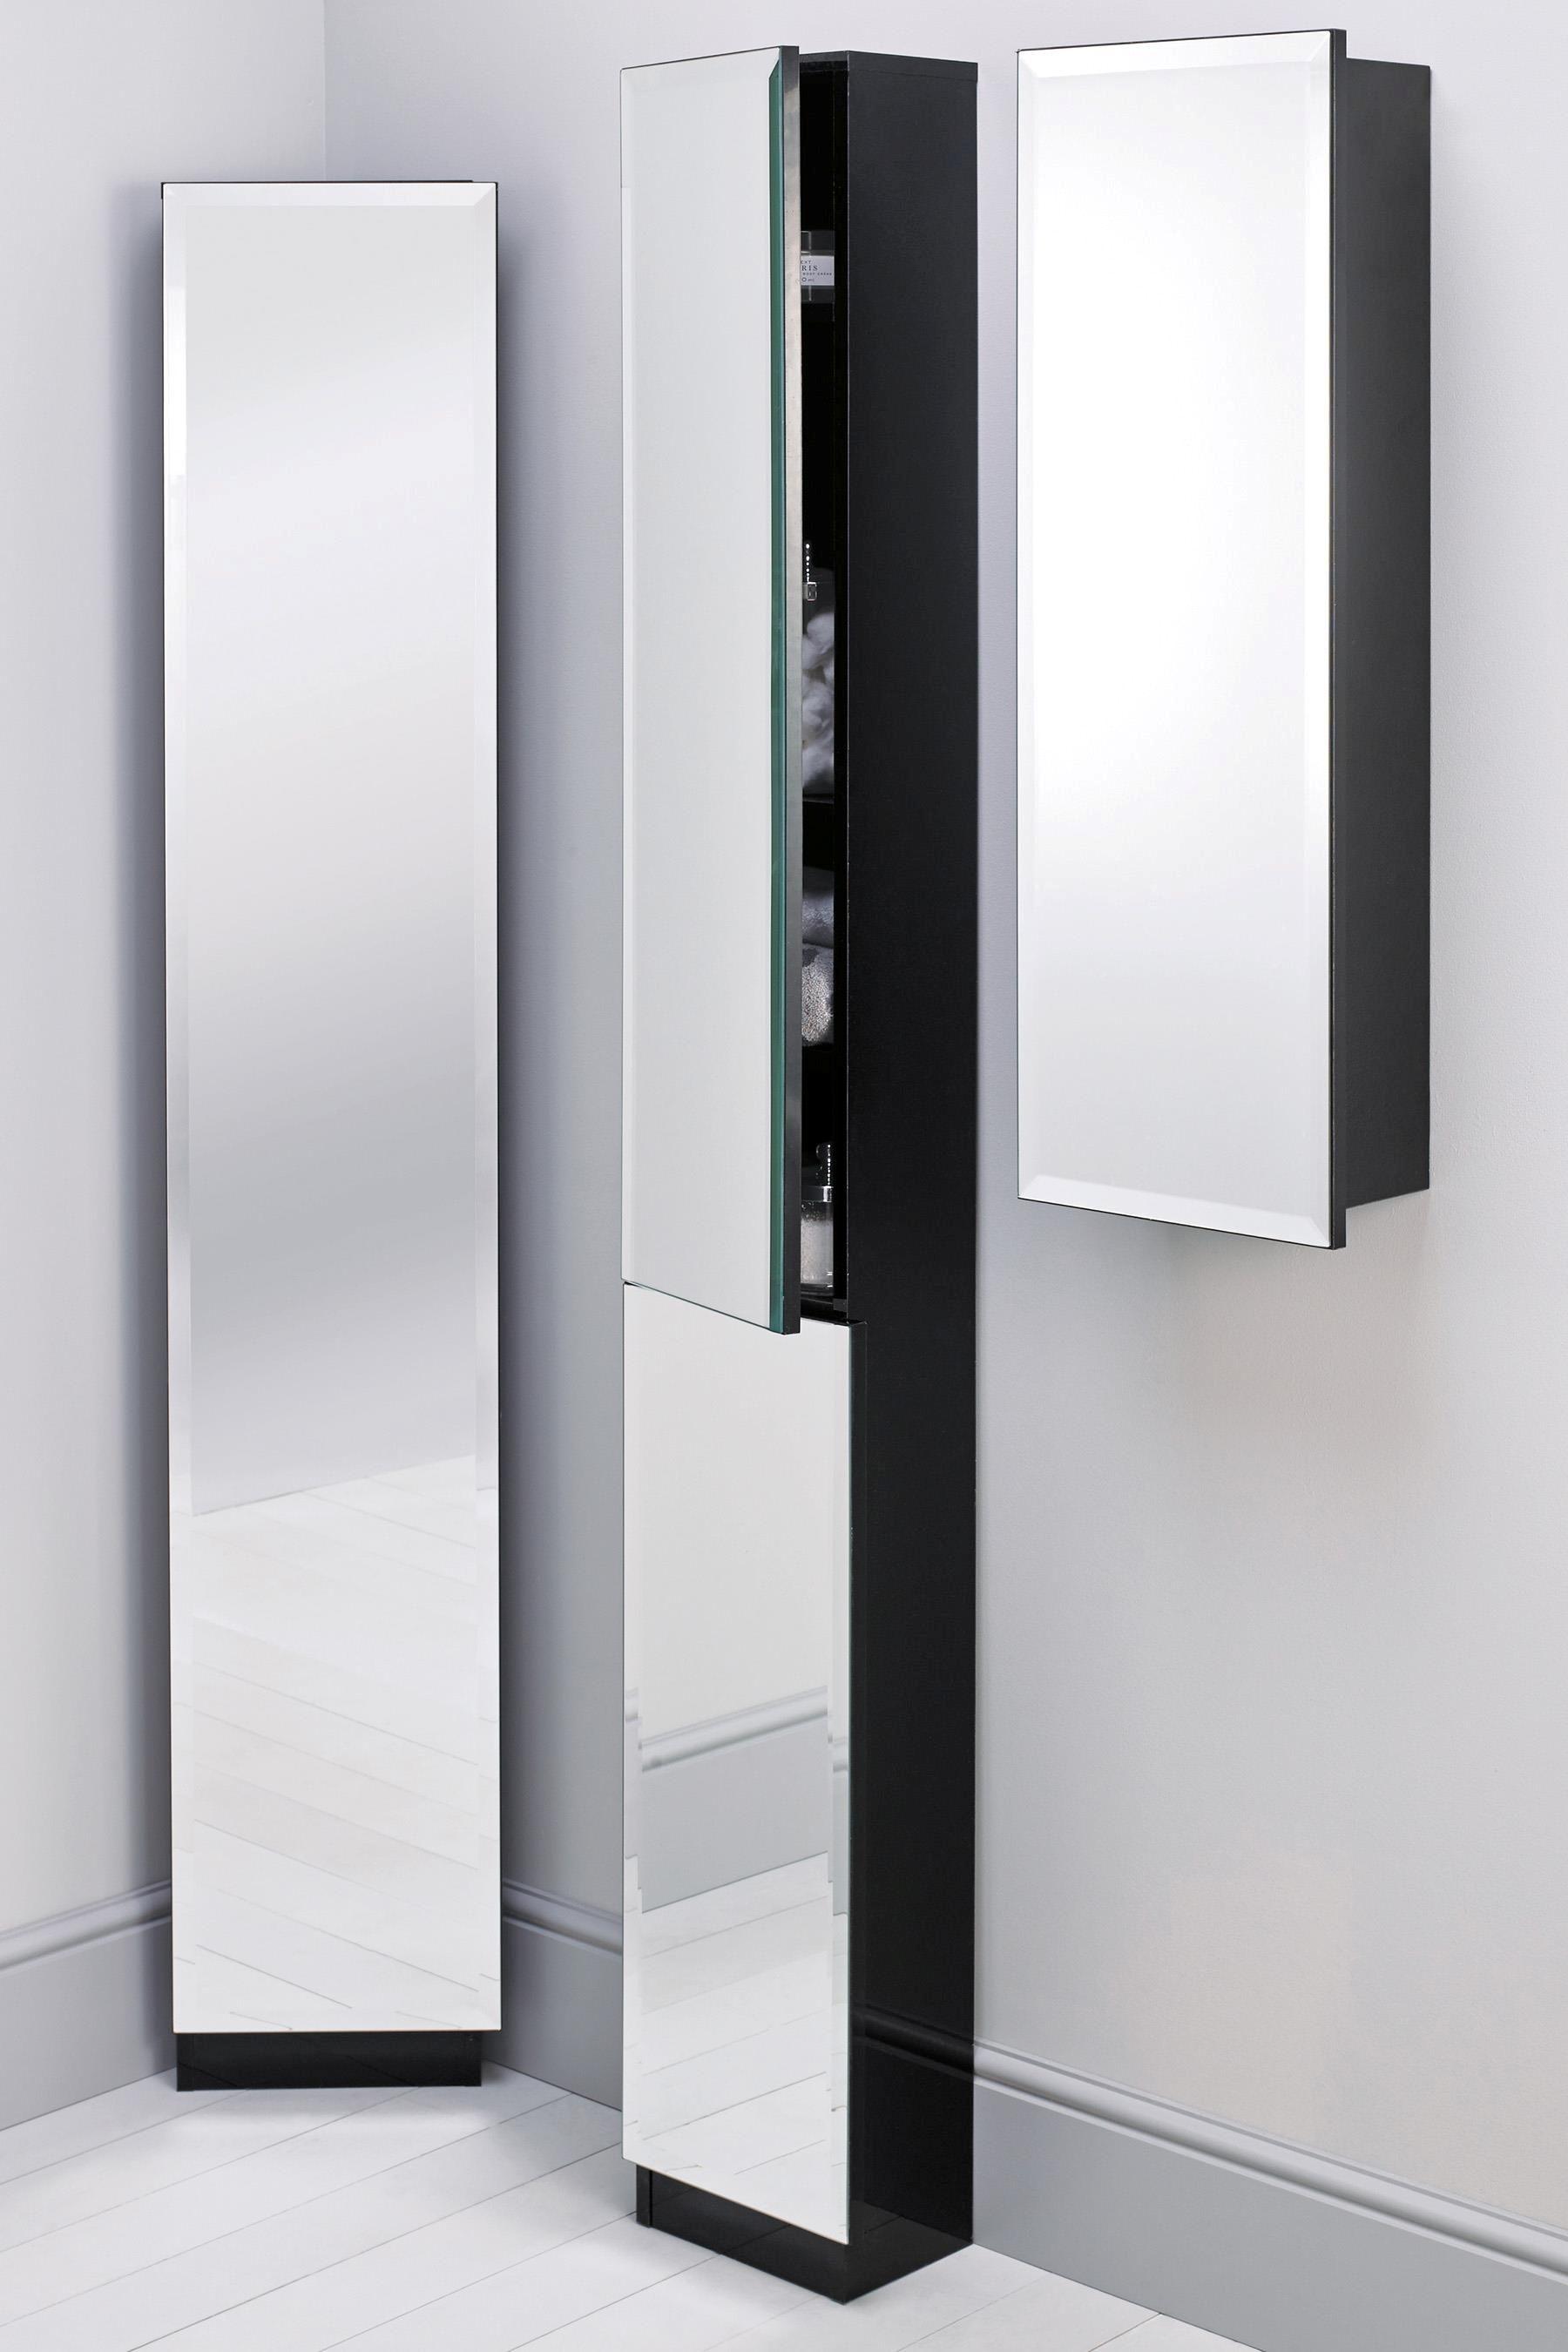 Tall Narrow Bathroom Mirrors